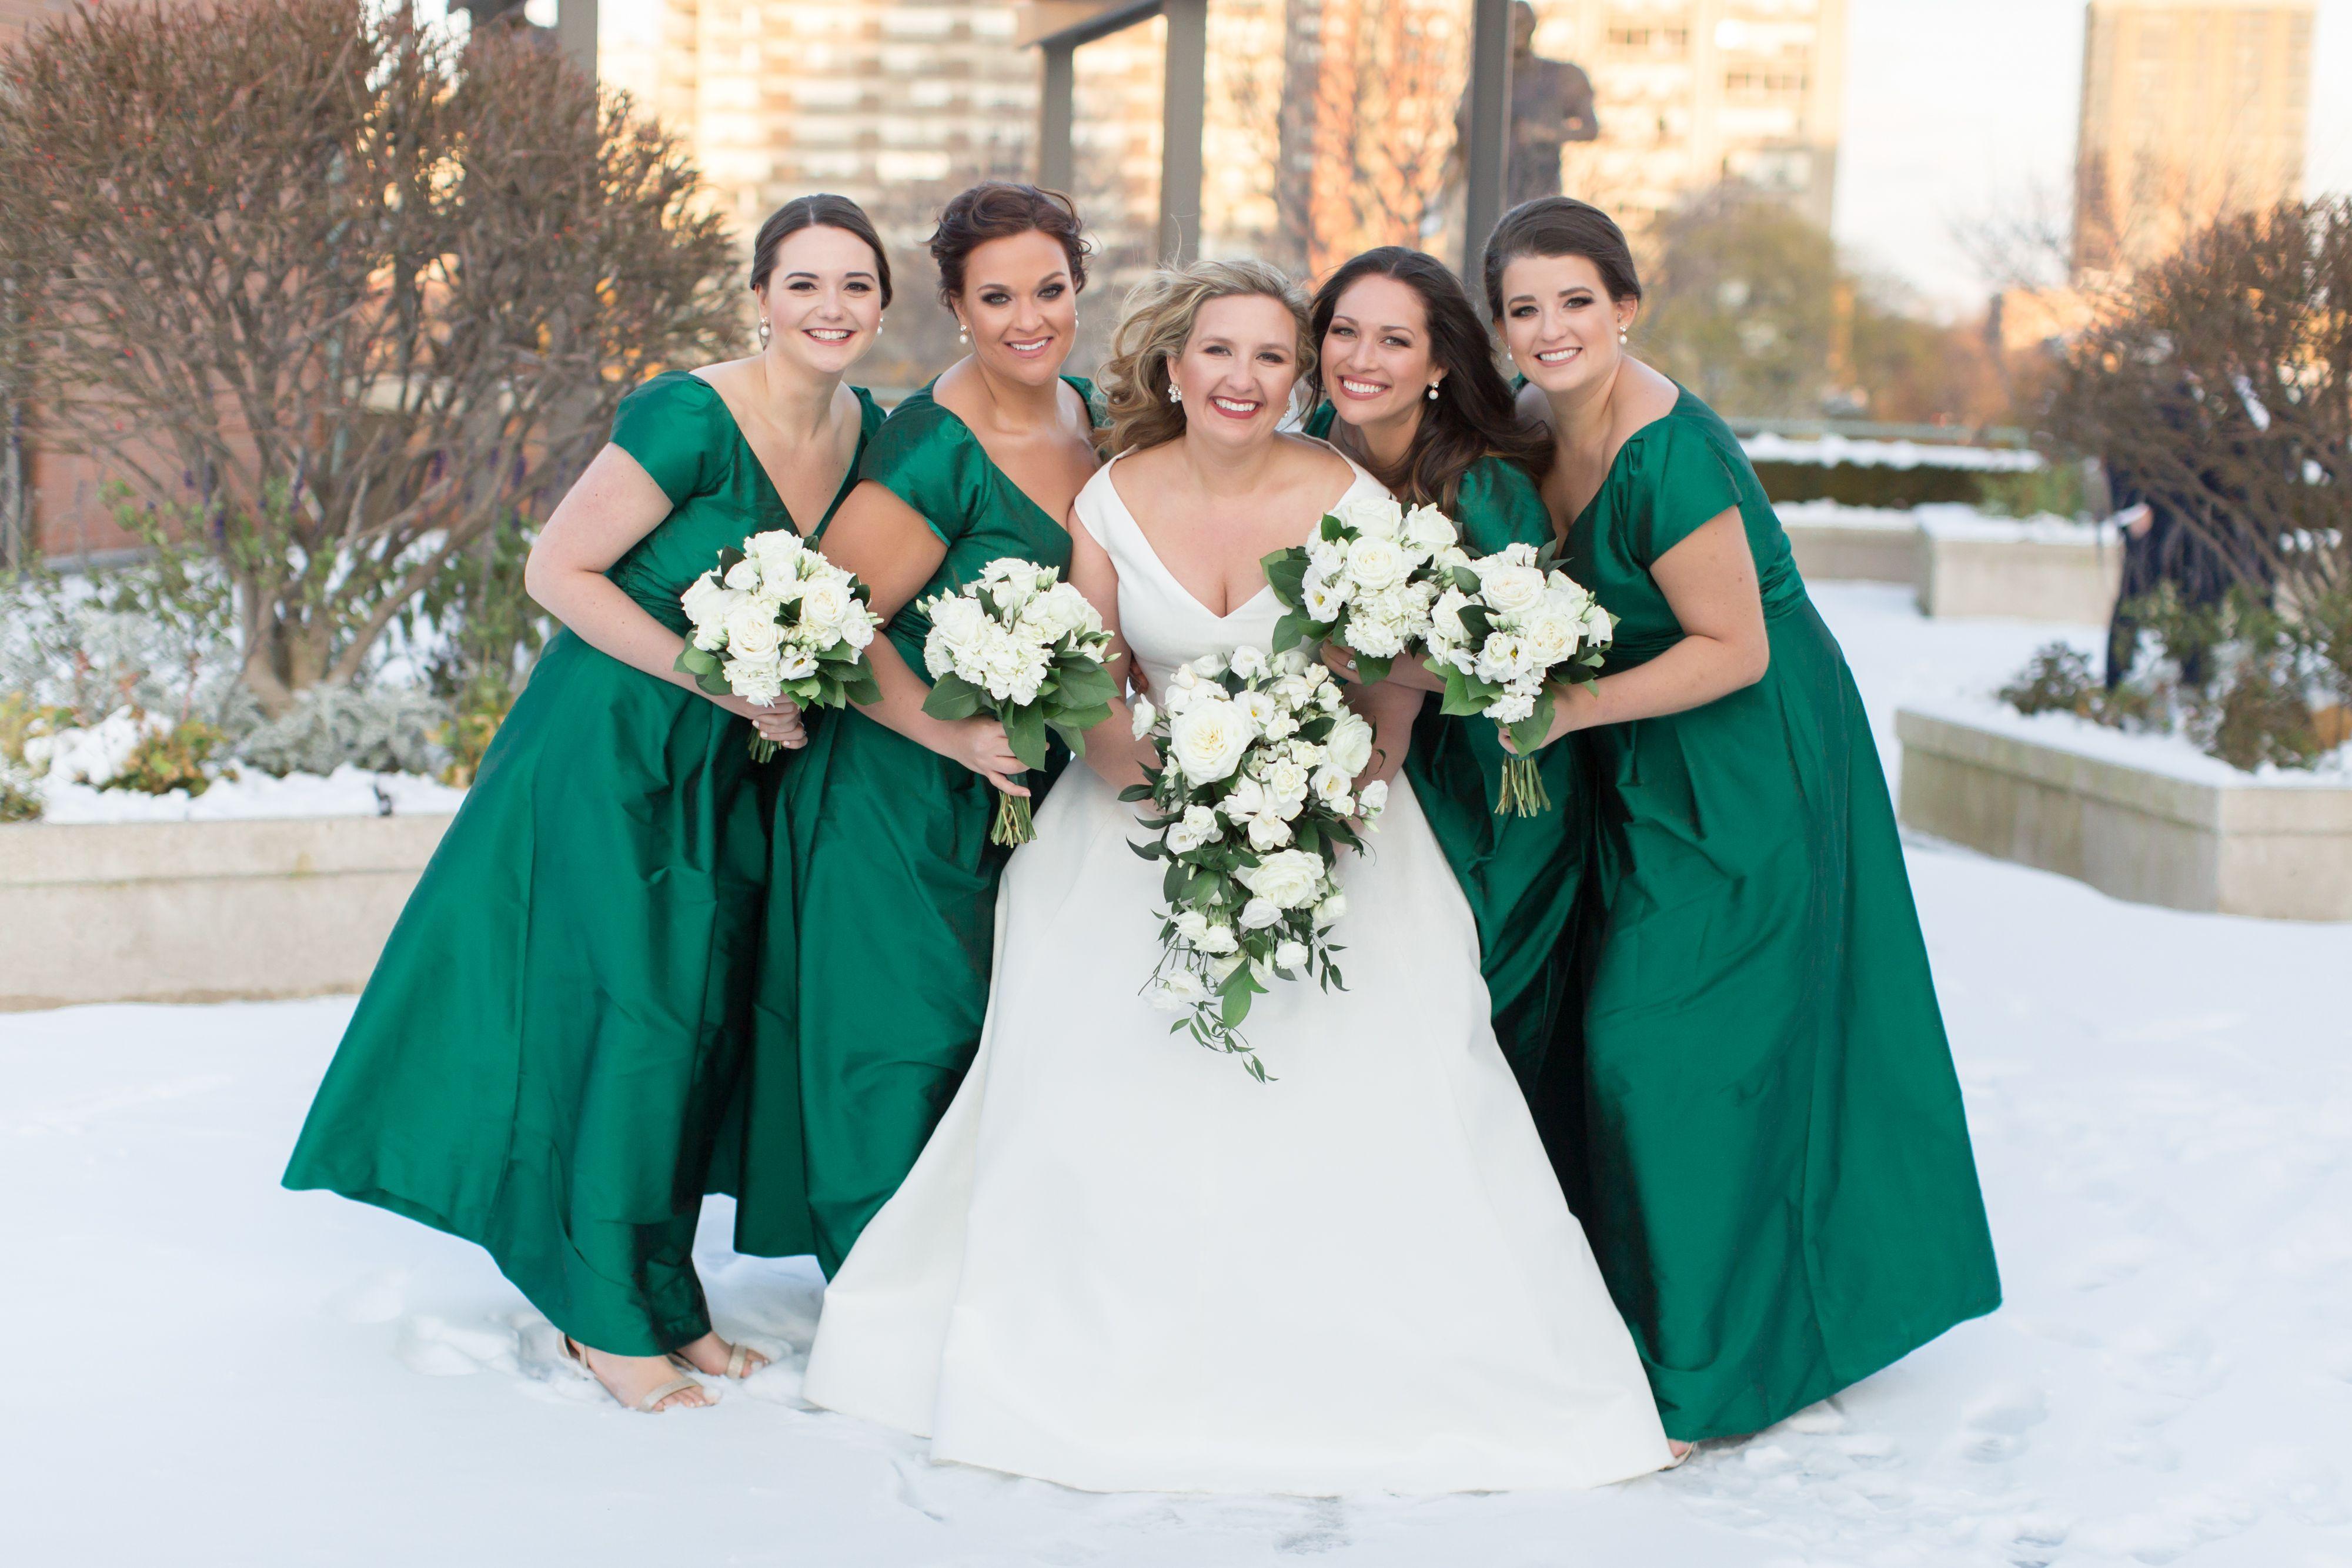 Downtown Milwaukee Winter Wedding Long Green Bridesmaid Dresses By Bella Bridesmaid Green Bridesmaid Dresses Bridesmaid Dresses Long Green Bridesmaid Dresses